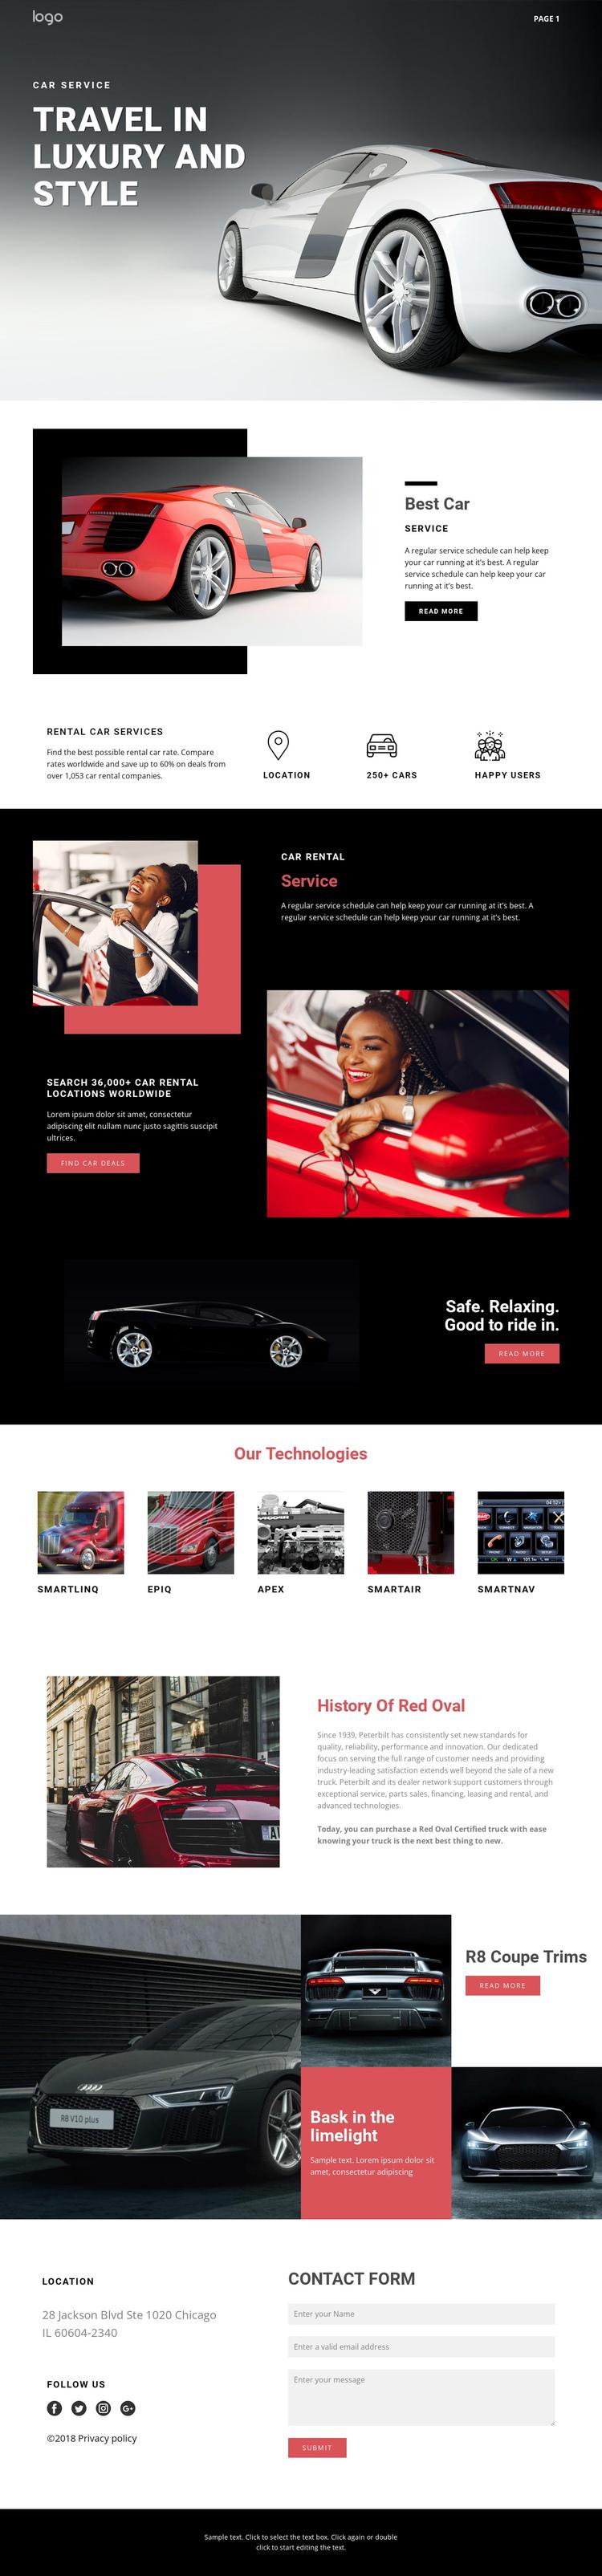 Traveling in luxury cars Website Builder Software